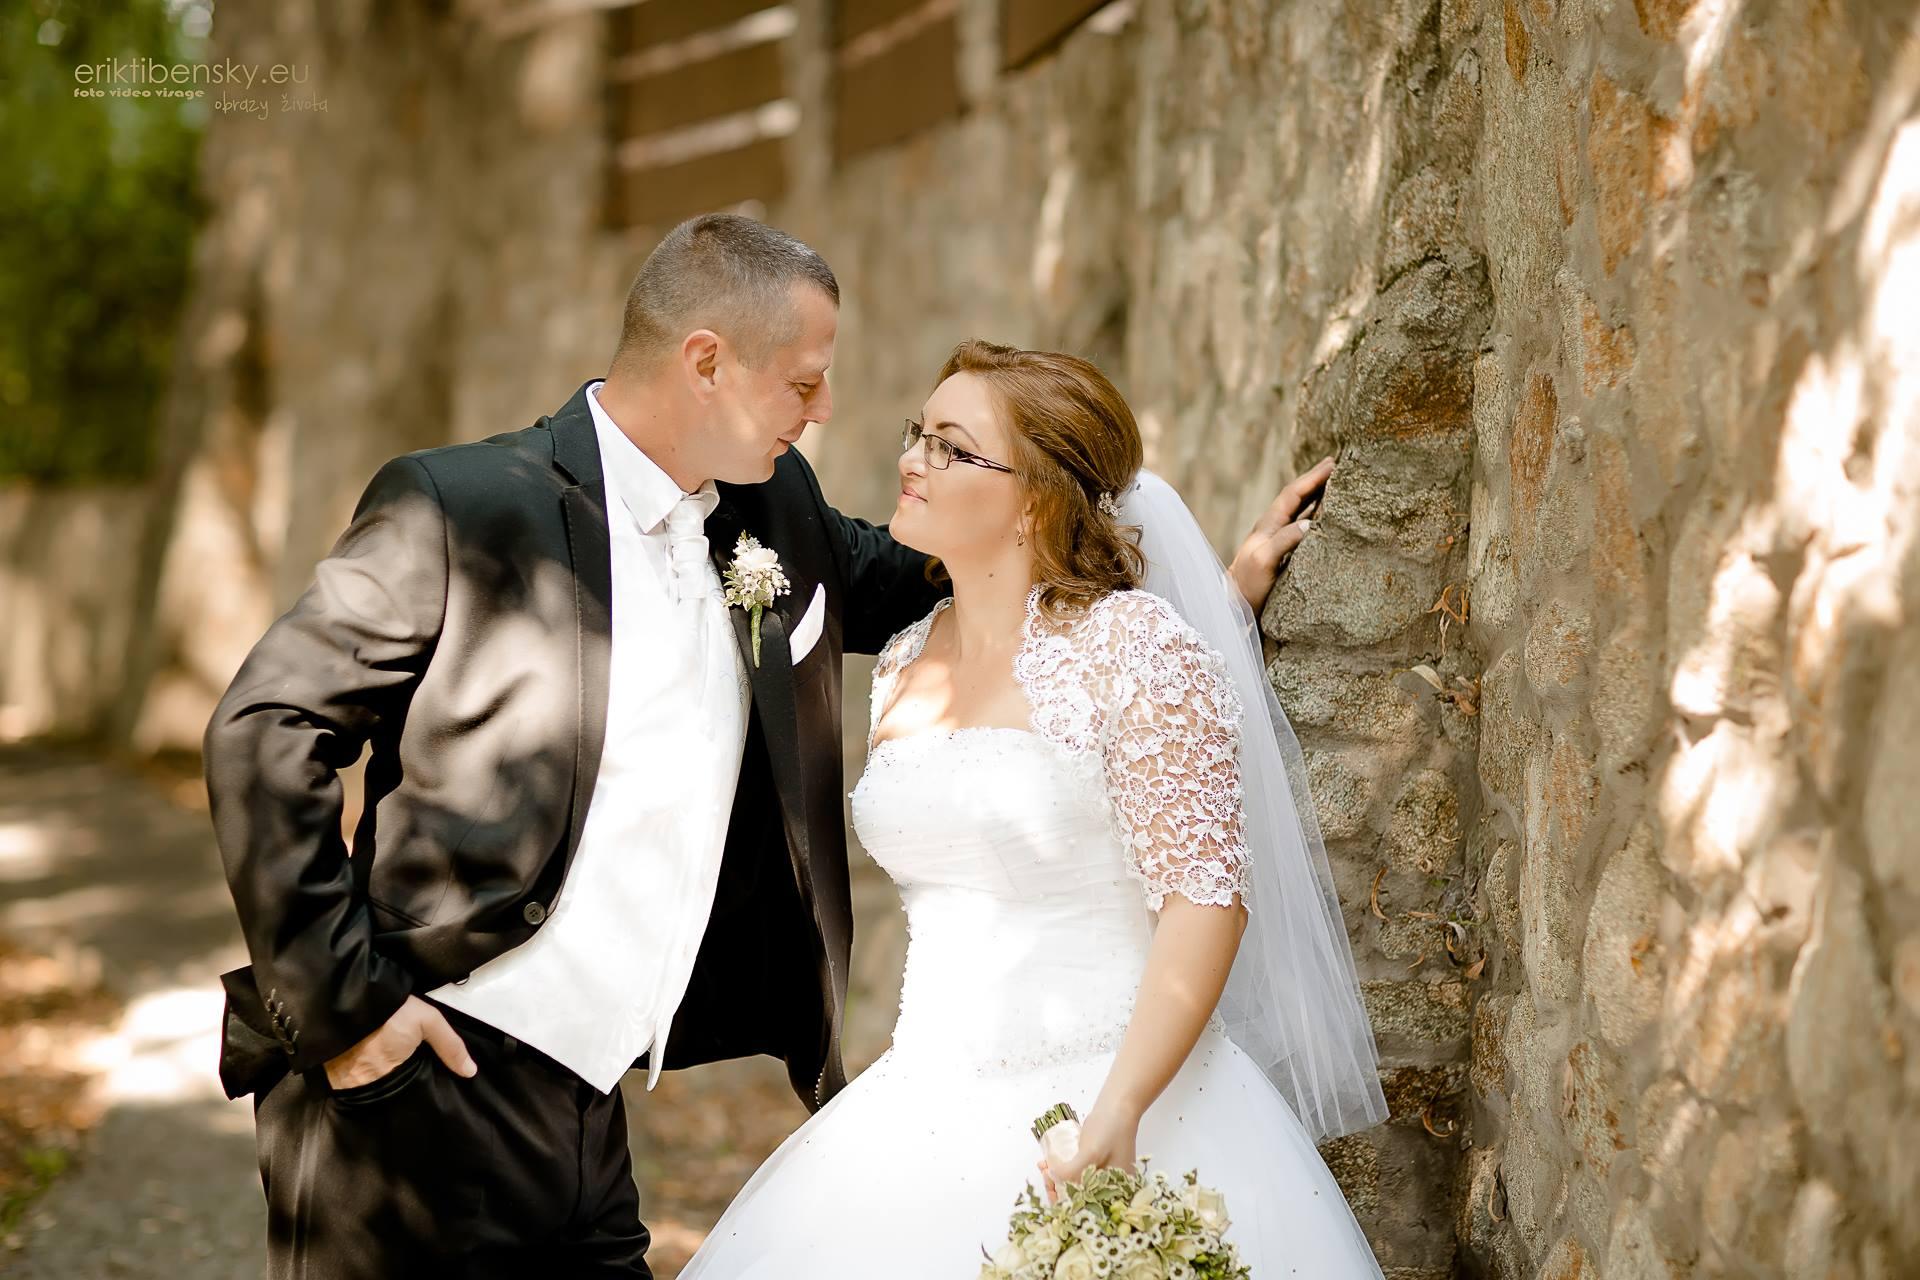 eriktibensky-eu-svadobny-fotograf-wedding-photographer-3031